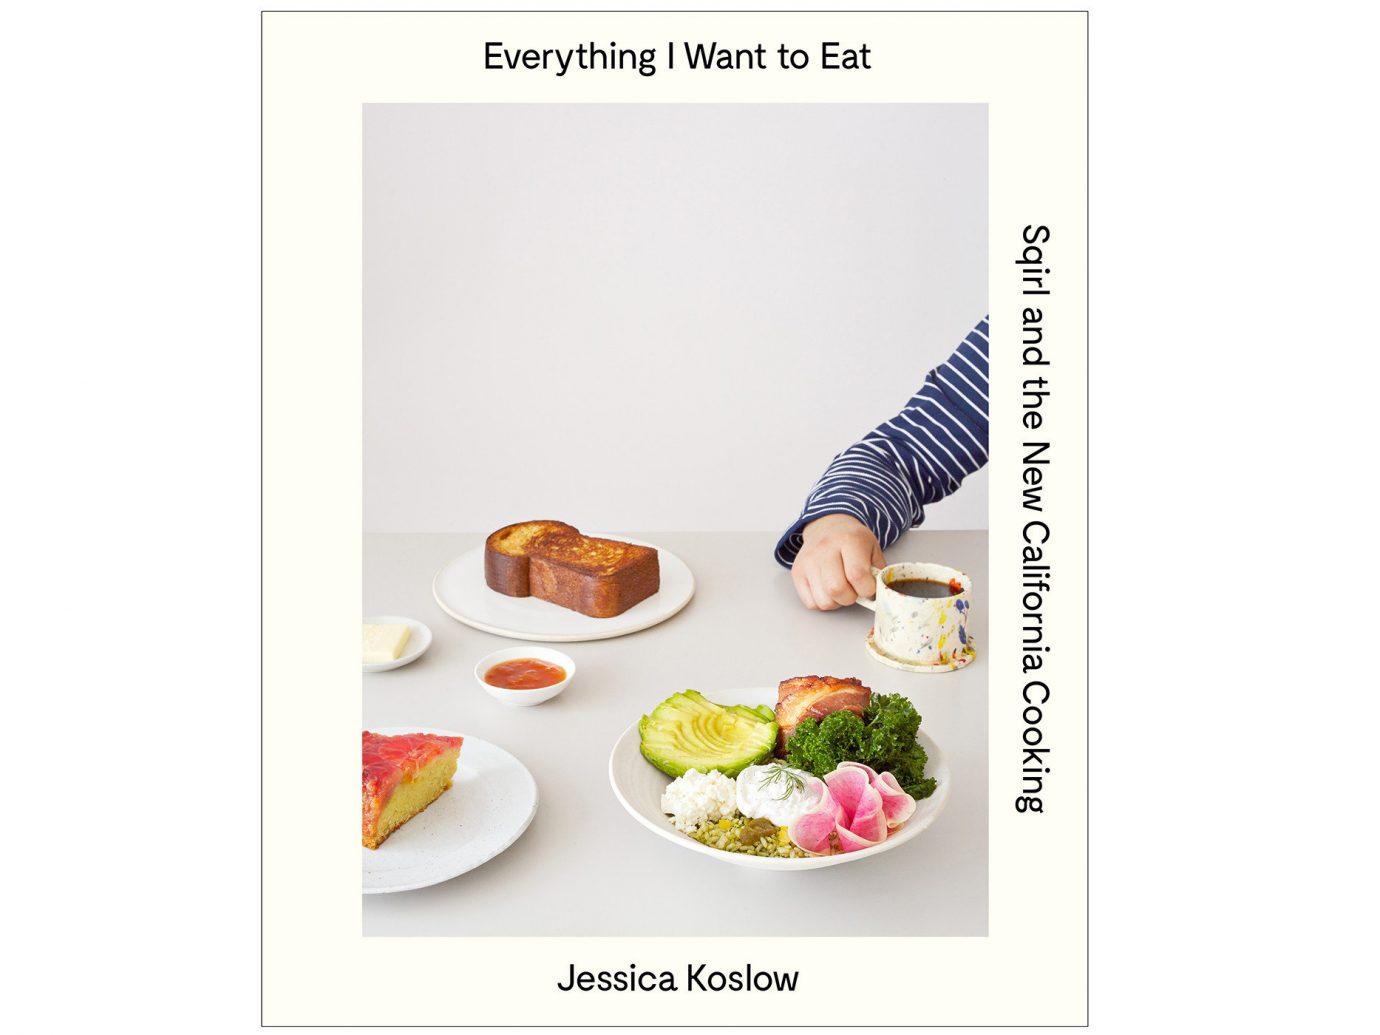 Food + Drink Health + Wellness Travel Tips human action product food dish cuisine meal brand presentation advertising screenshot